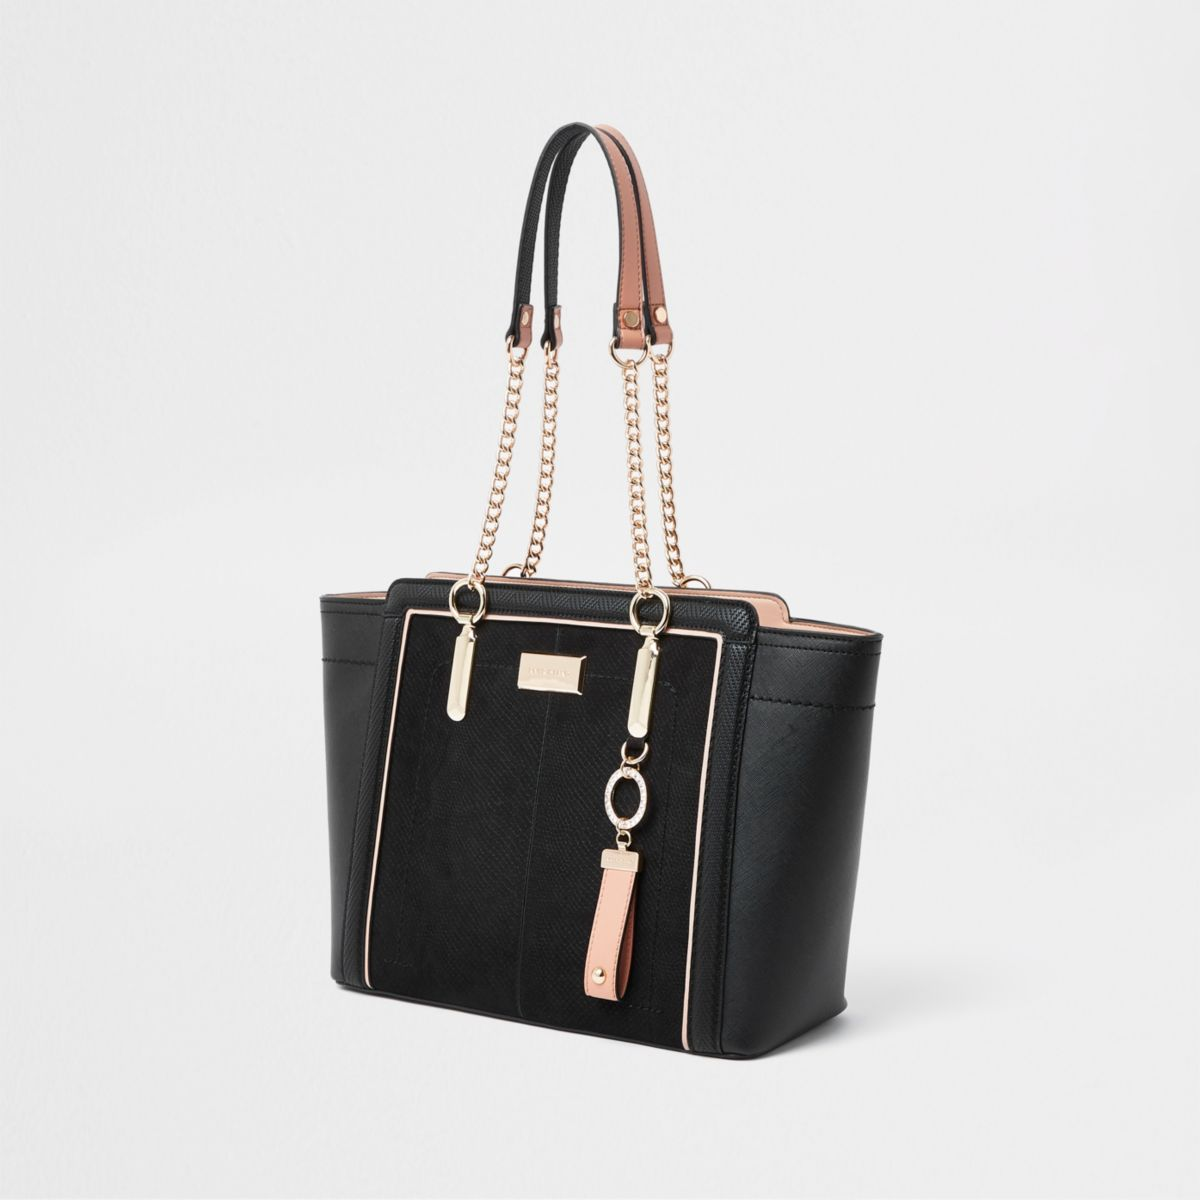 Black winged chain handle tote bag